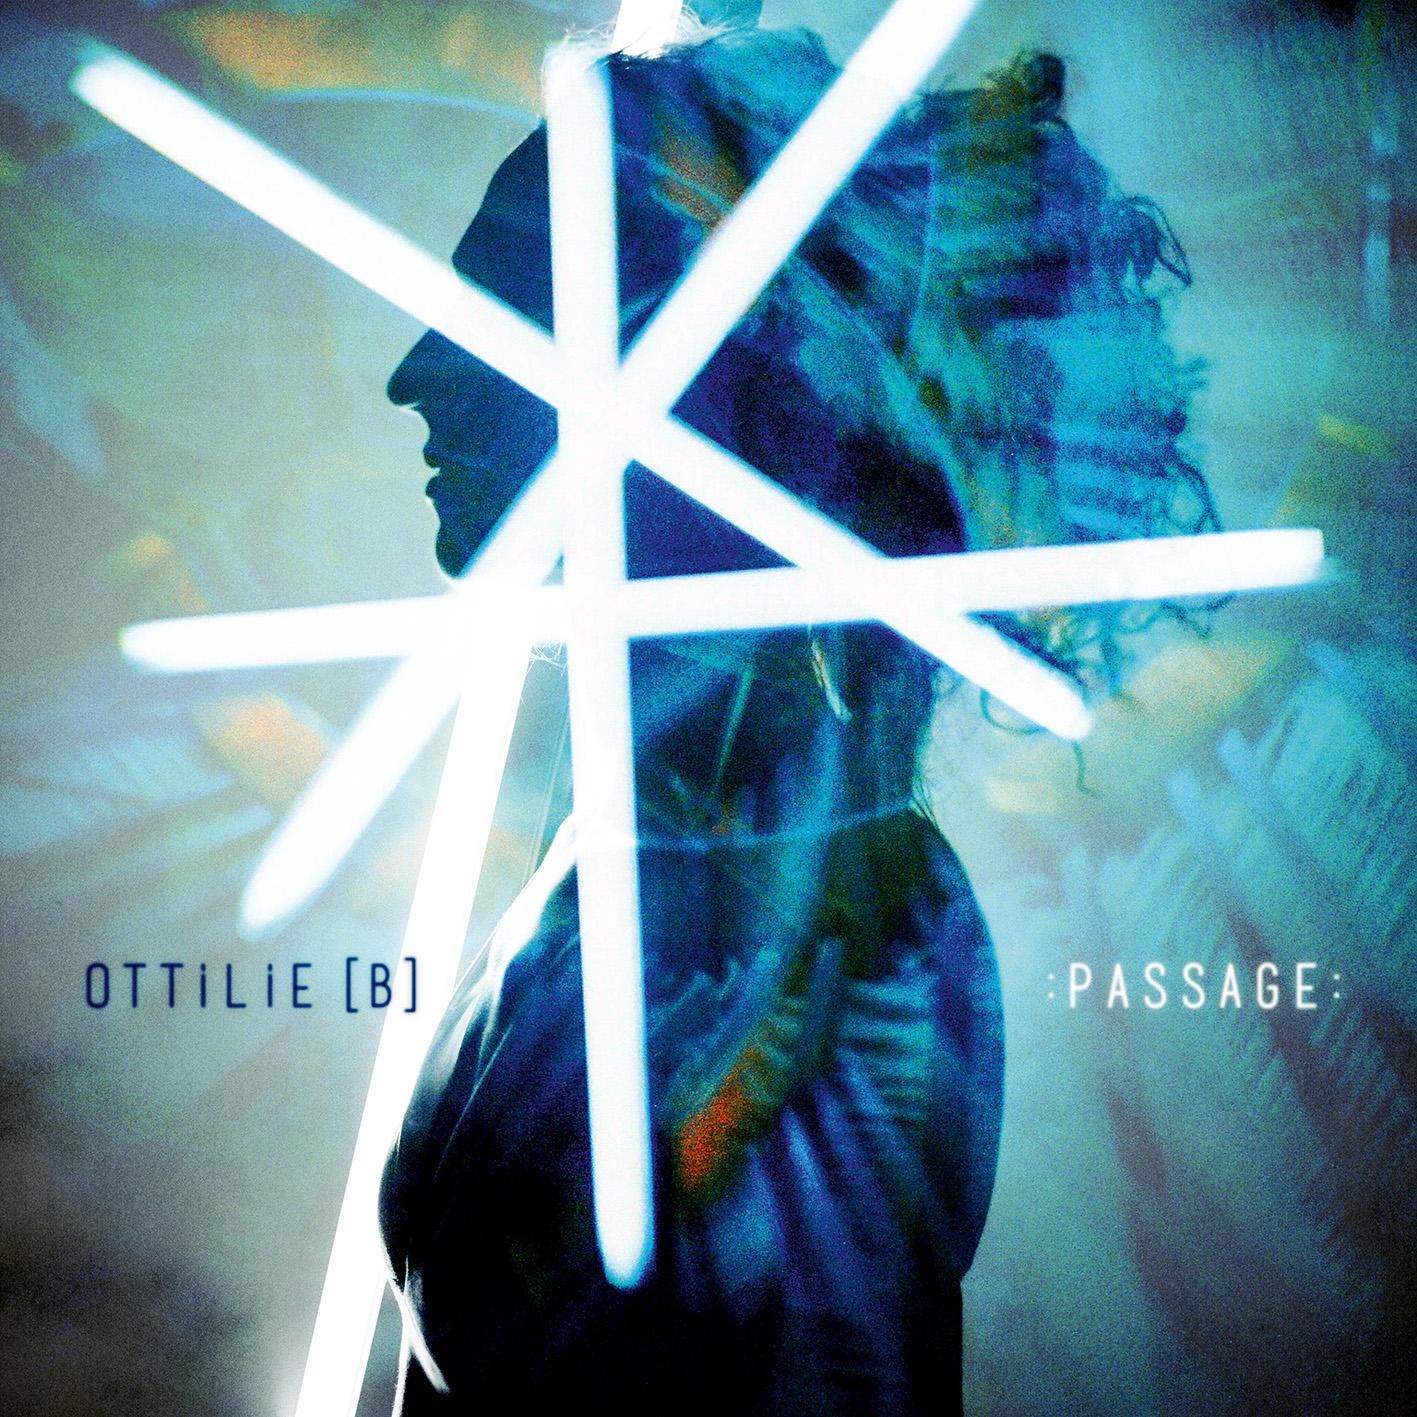 ottilieb_passage